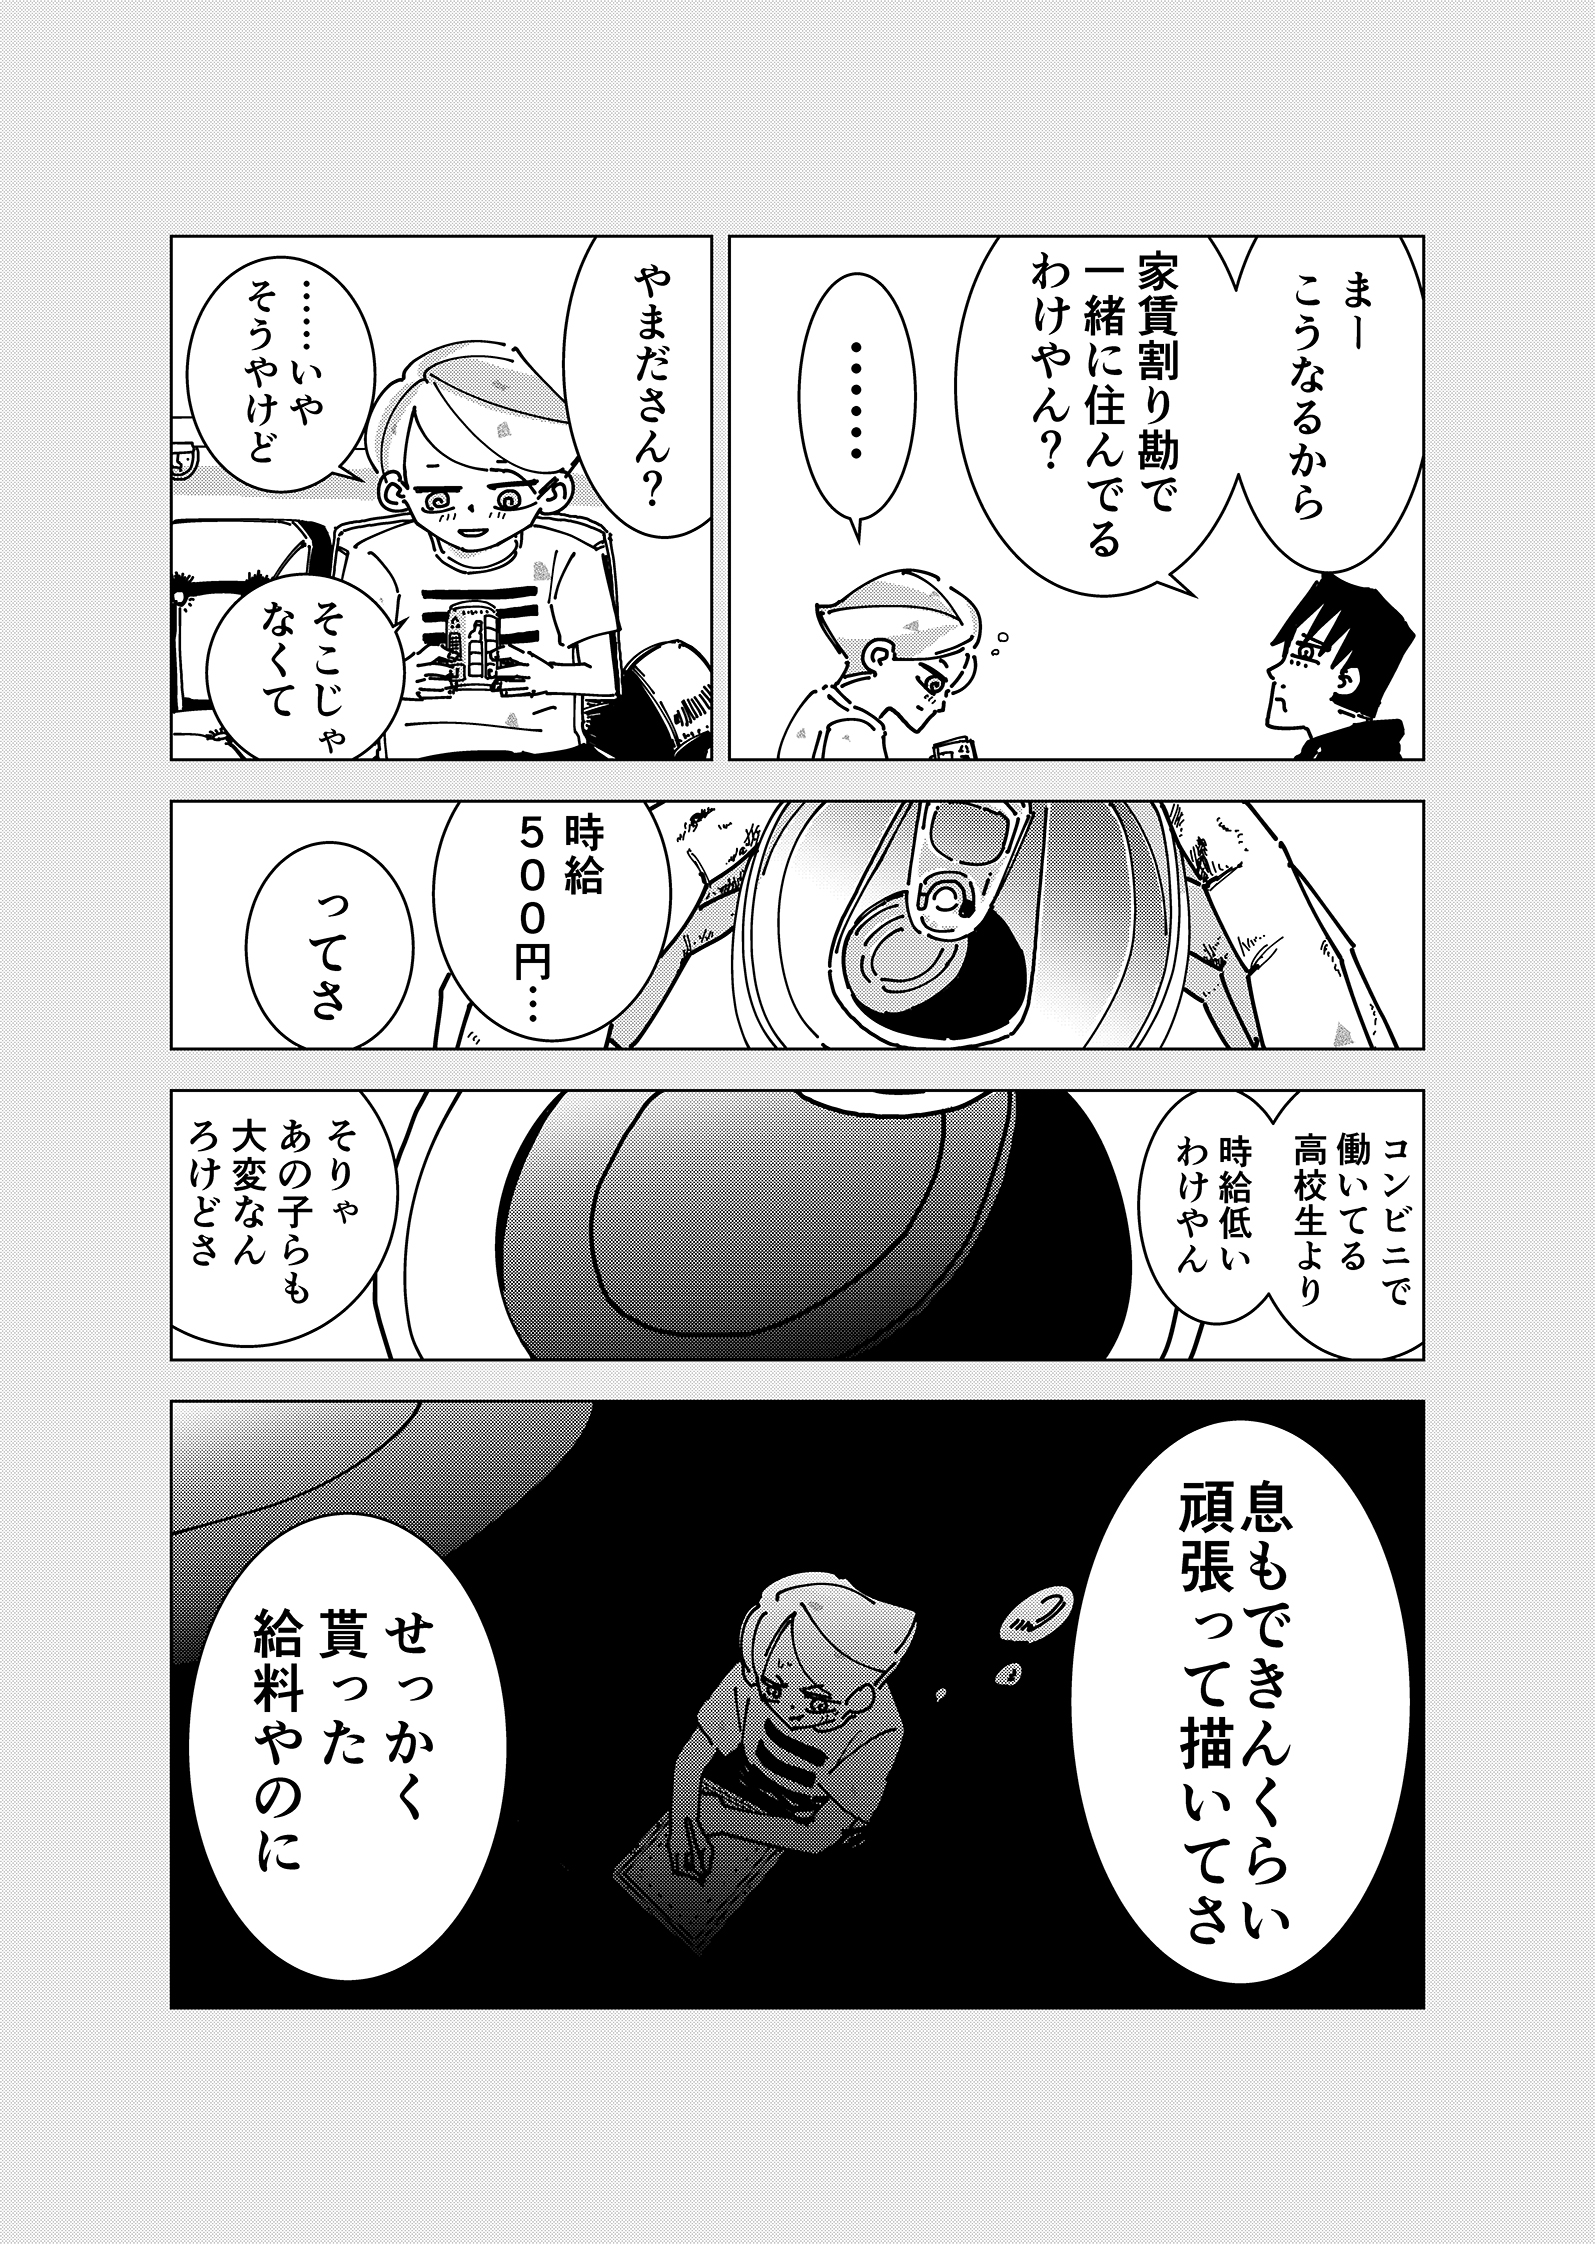 shareman02_007